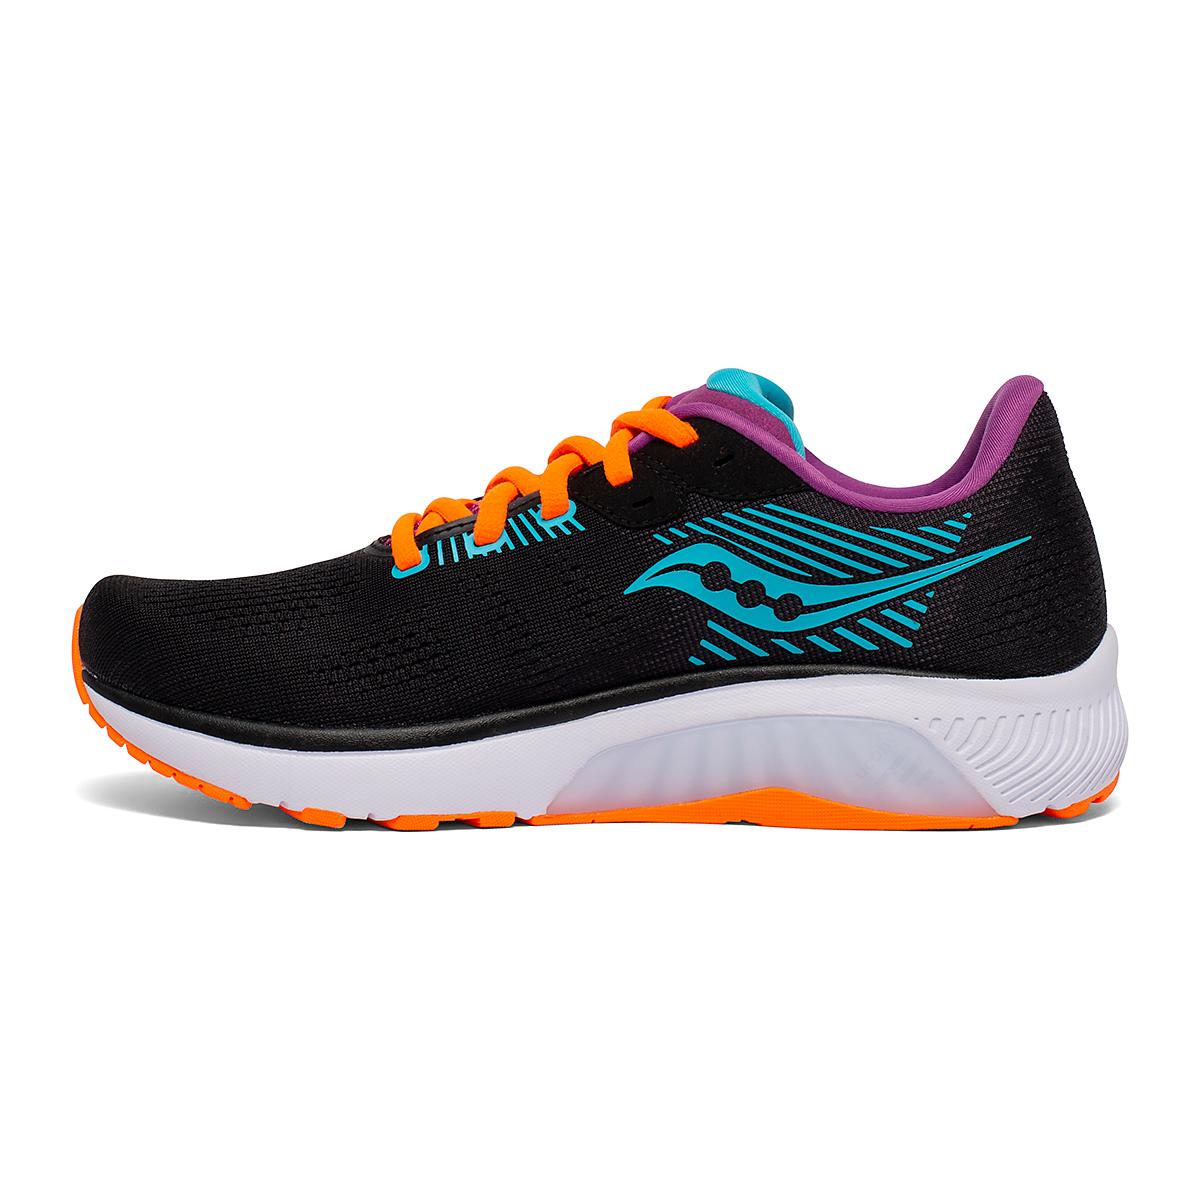 Women's Saucony Guide 14 Running Shoe - Color: Future/Black - Size: 5 - Width: Regular, Future/Black, large, image 2